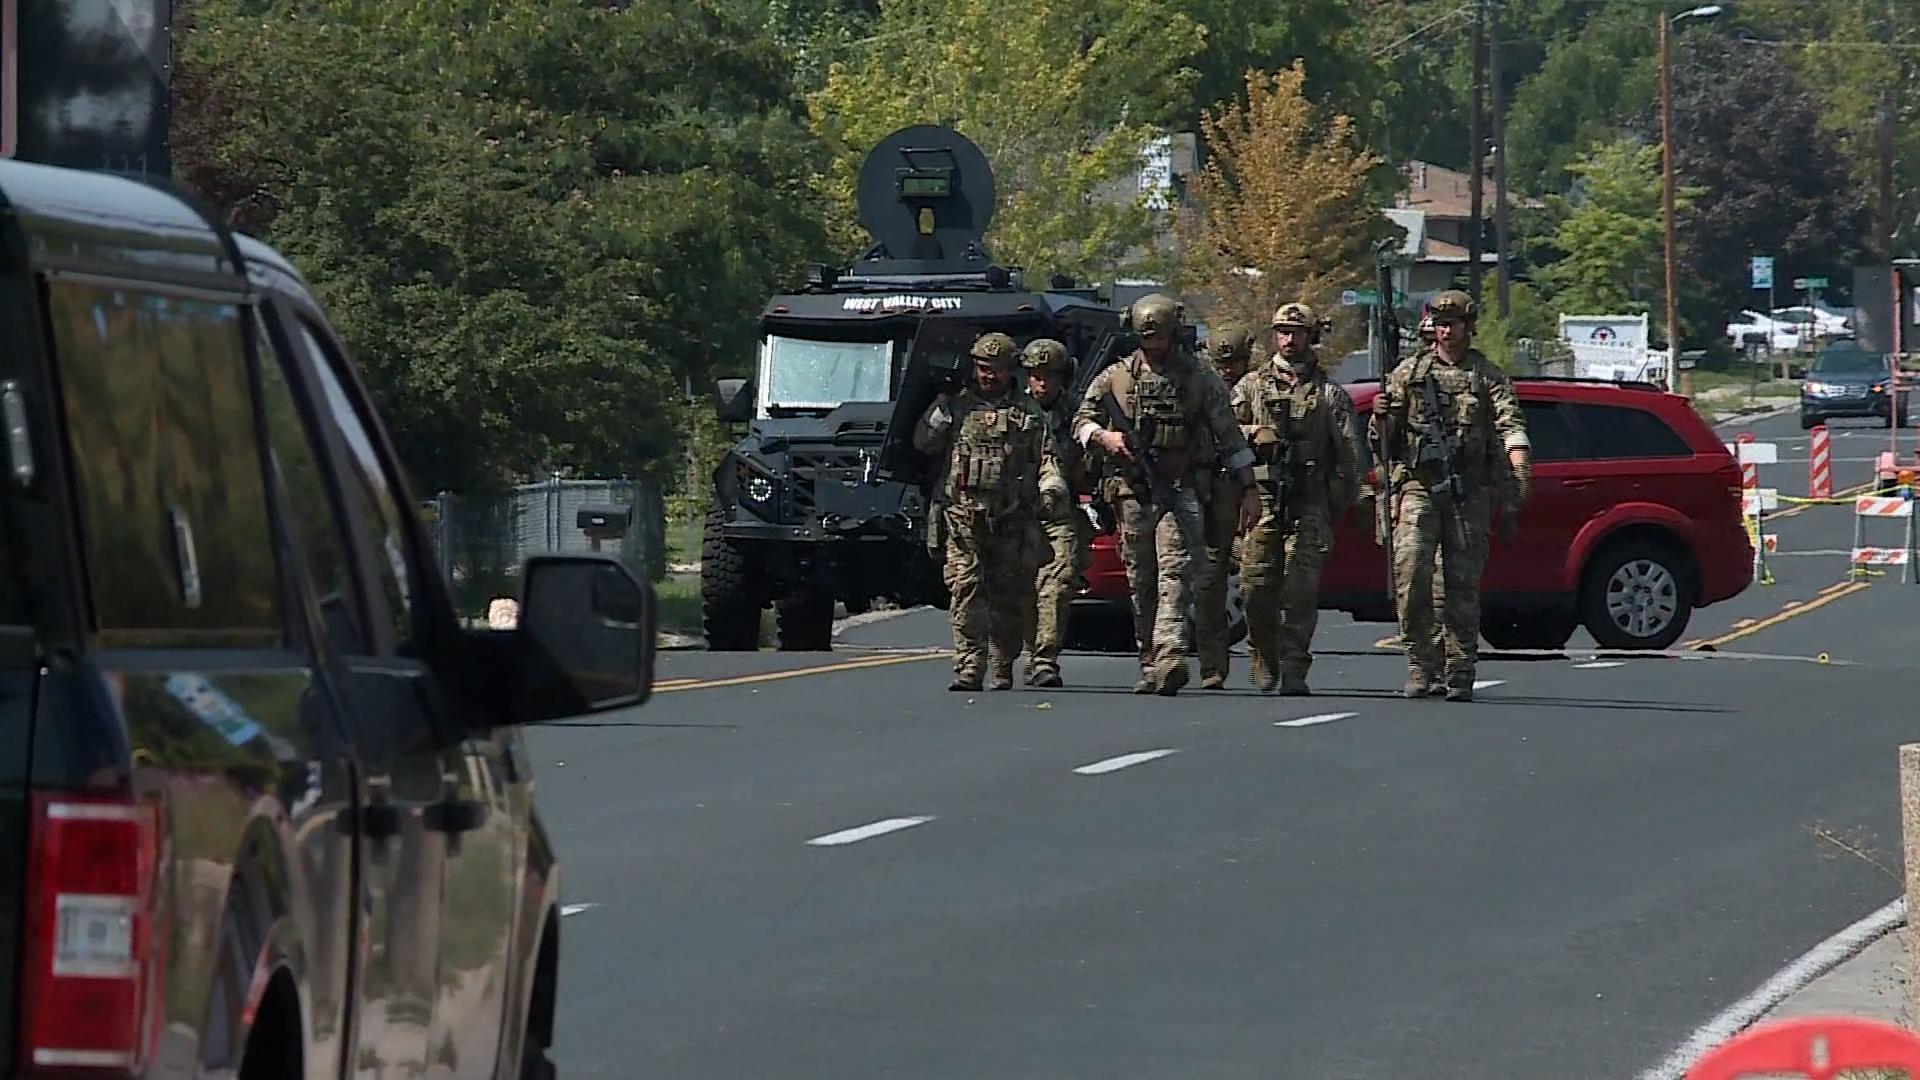 3 dead, 1 rescued in Salt Lake City standoff